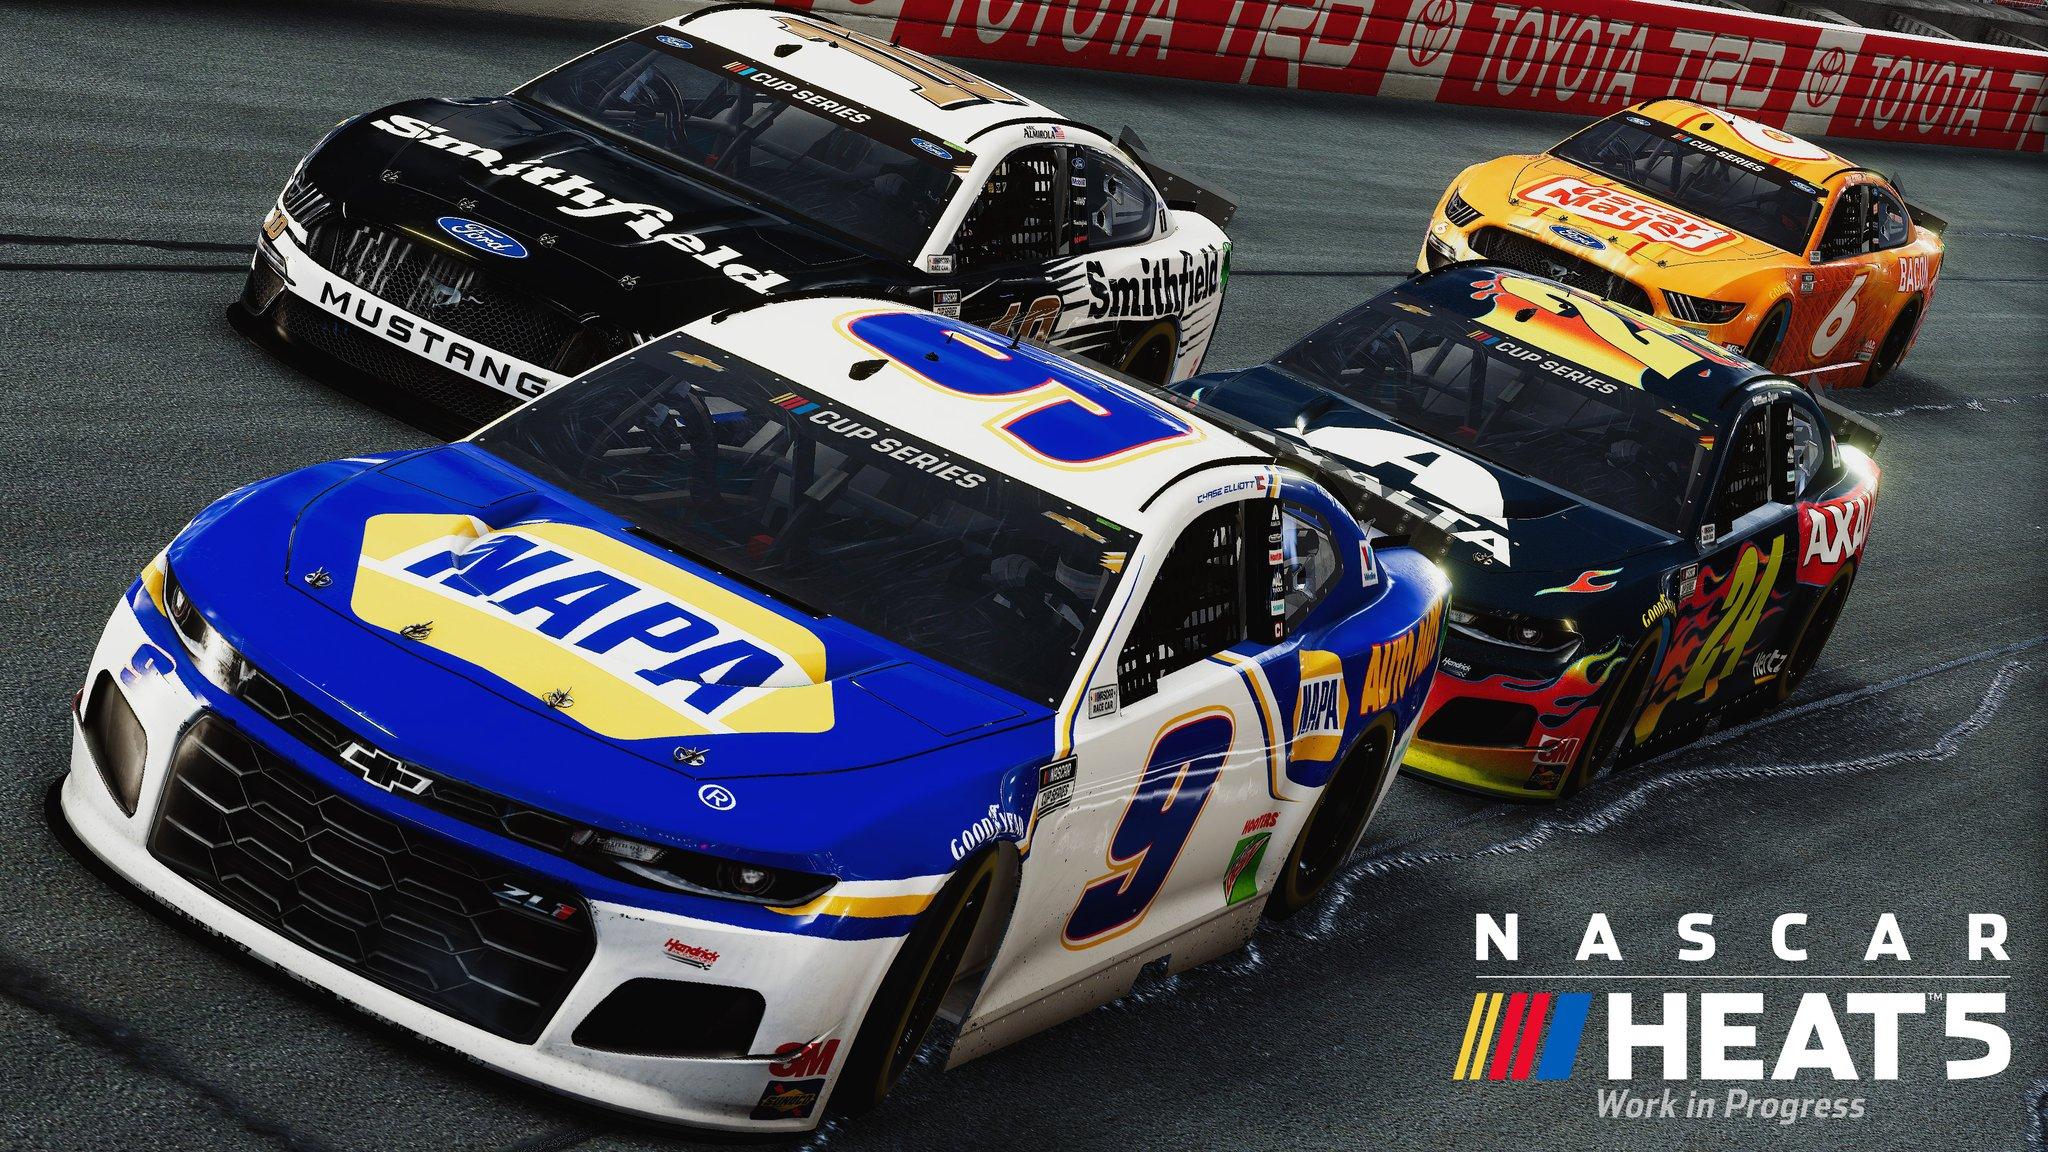 NASCAR-Heat-5-11